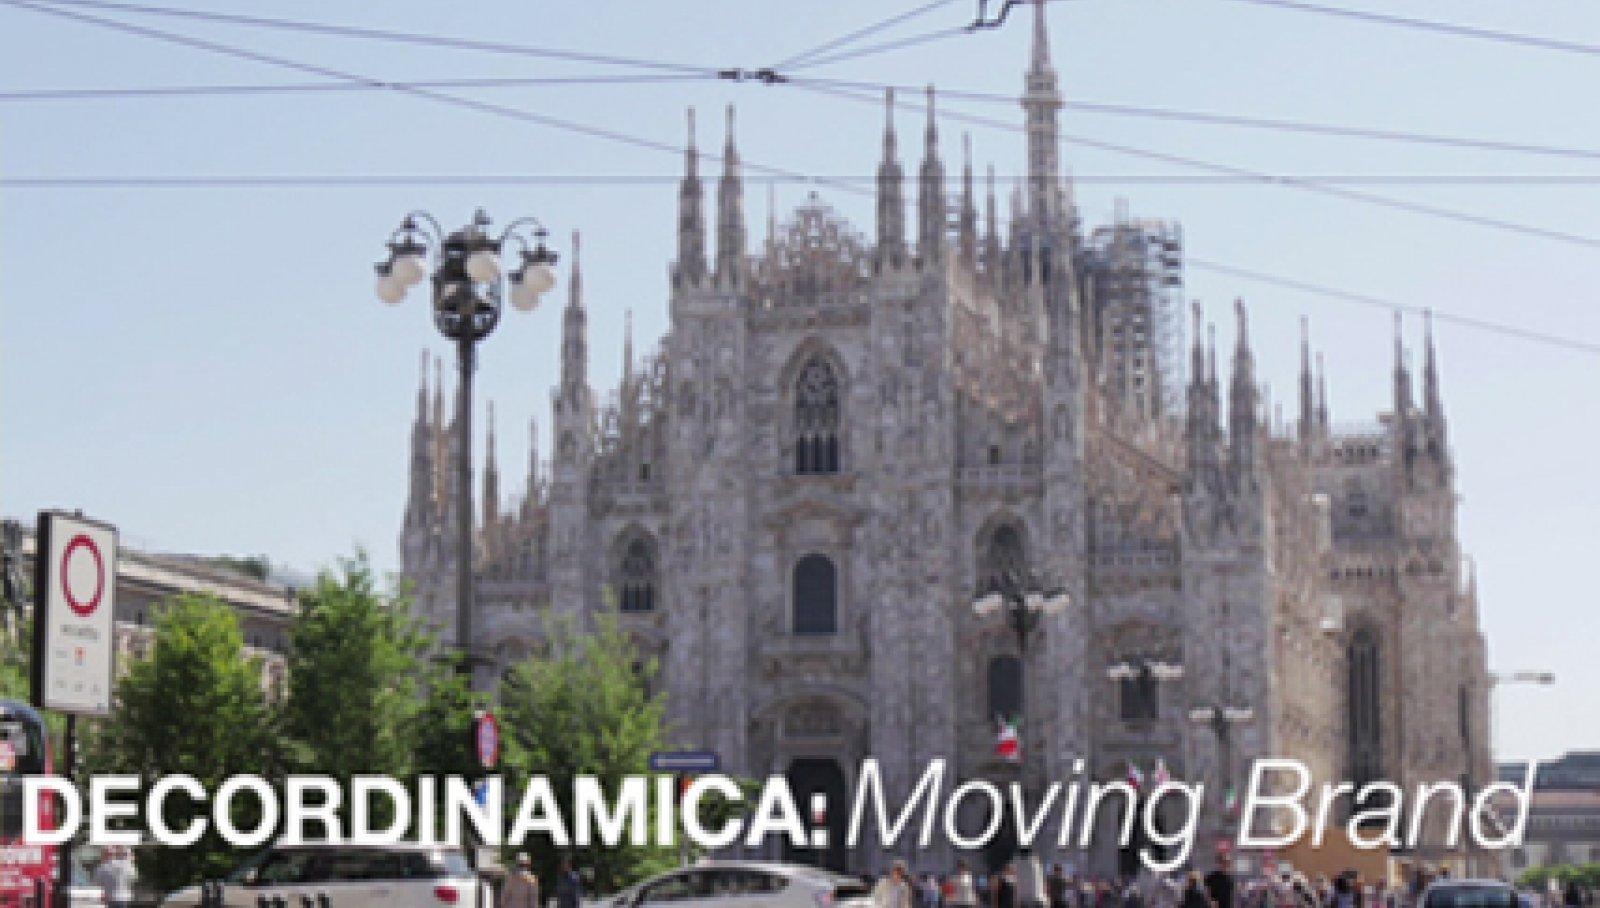 Decordinamica Moving Brands IGPDecaux